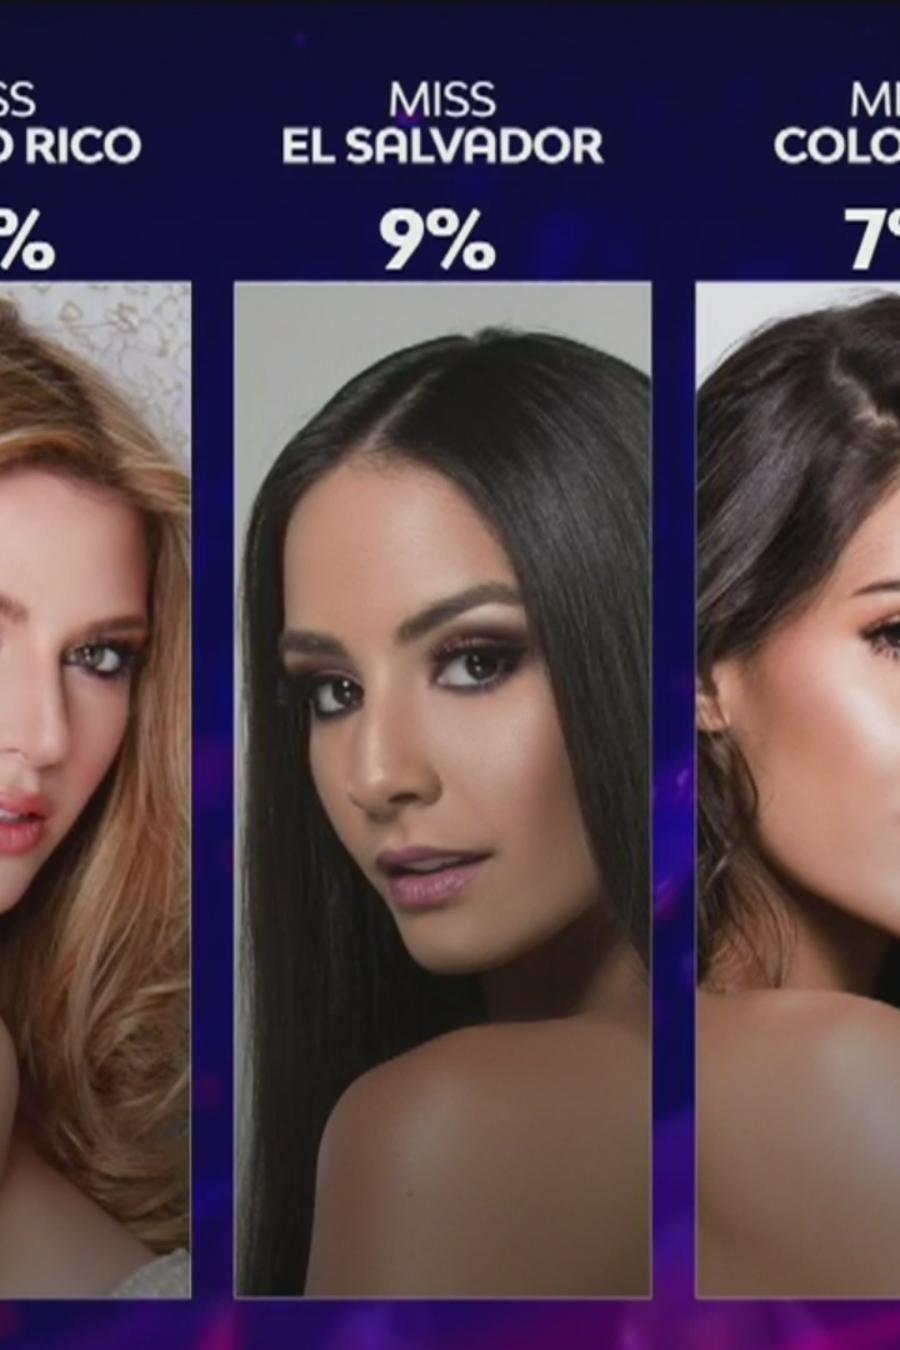 Júlia Horta, Miss Brasil 2019, Madison Anderson, Miss Puerto Rico, Zuleika Soler, Miss El Salvador, Gabriela Tafur, Miss Colombia, Sofía Aragón, Miss México, Miss Universo 2019